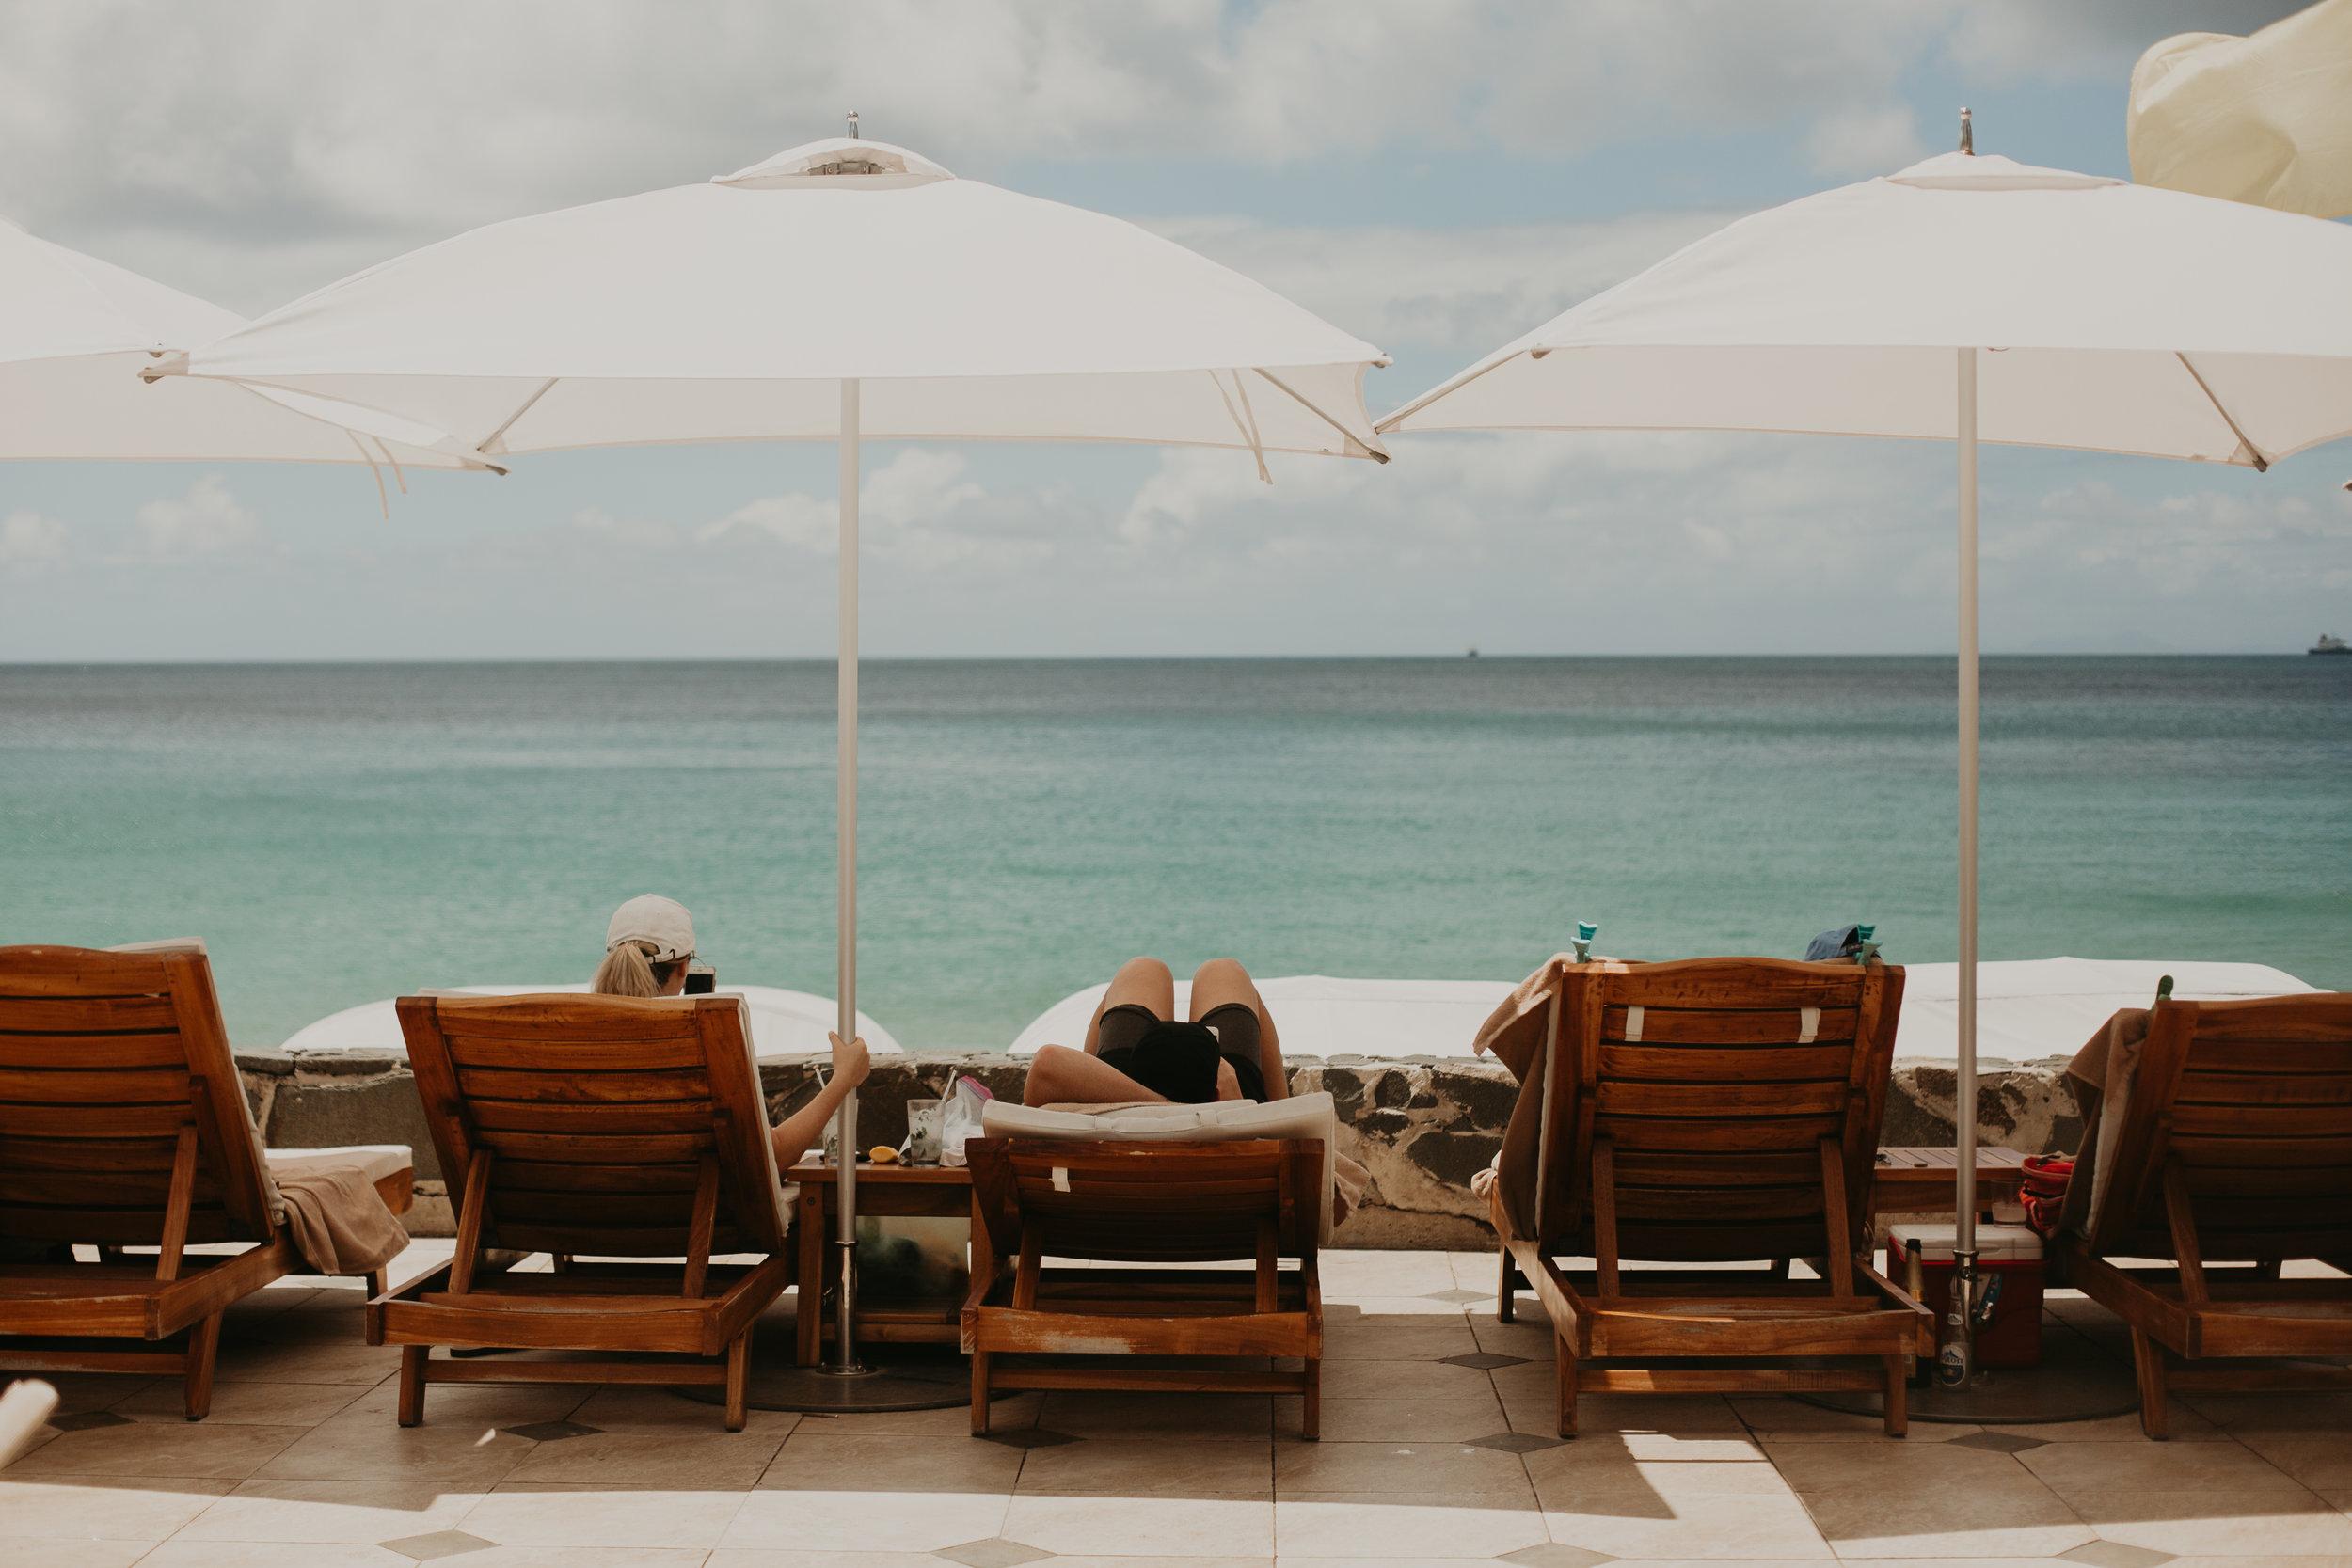 nicole-daacke-photography-destination-wedding-in-st-lucia-sandals-la-toc-intimate-island-wedding-carribean-elopement-photographer-chill-island-wedding-1.jpg